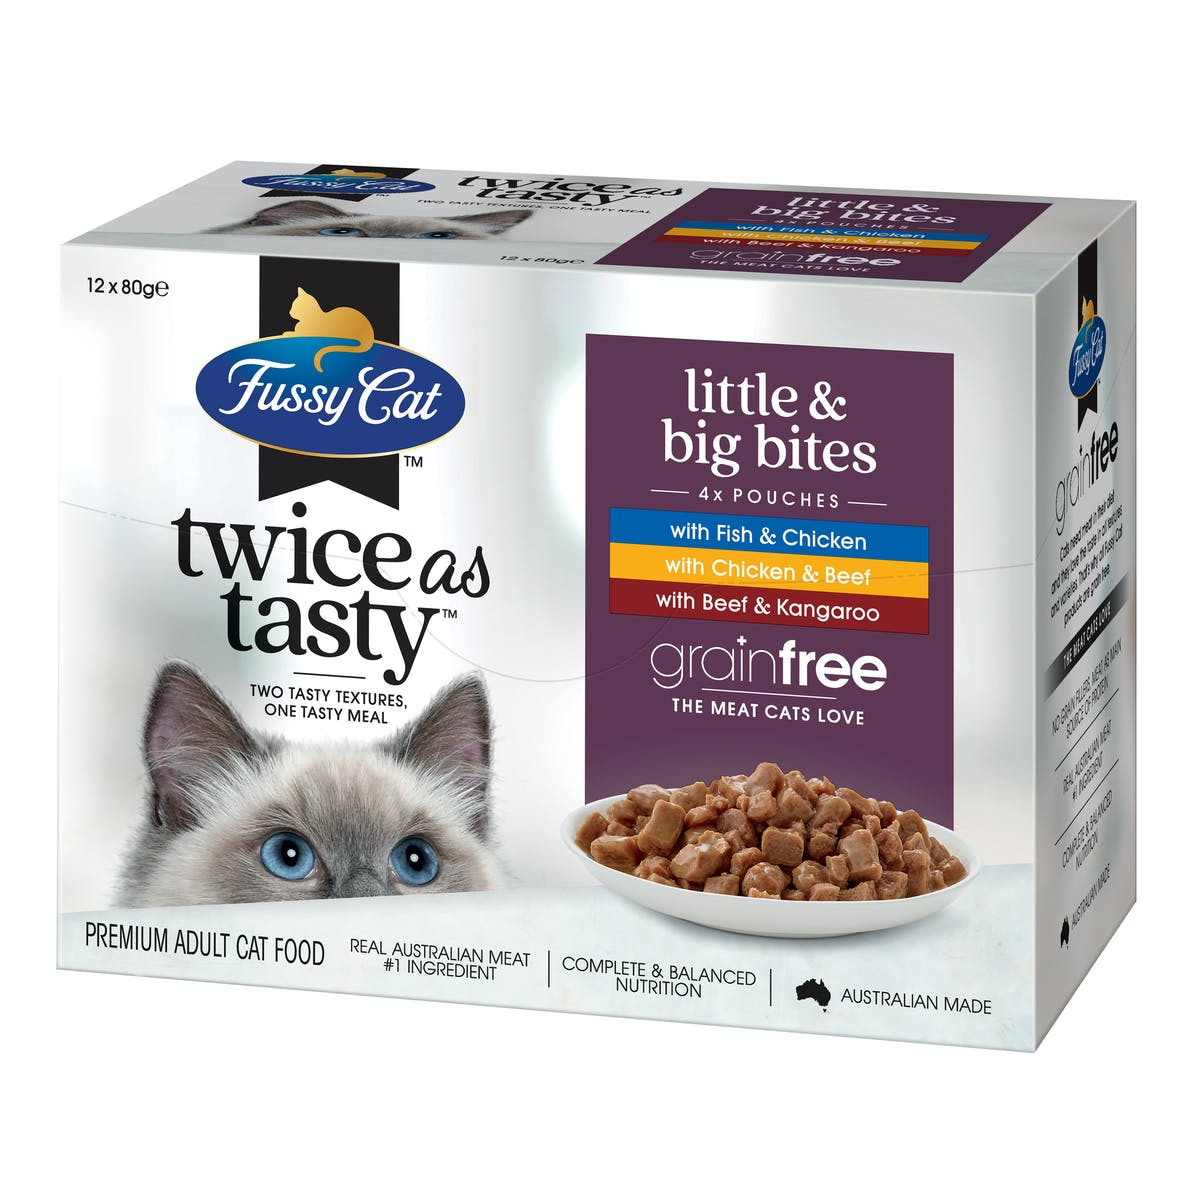 Fussy Cat   Little & Big Bites   Wet Cat Food   Left of pack